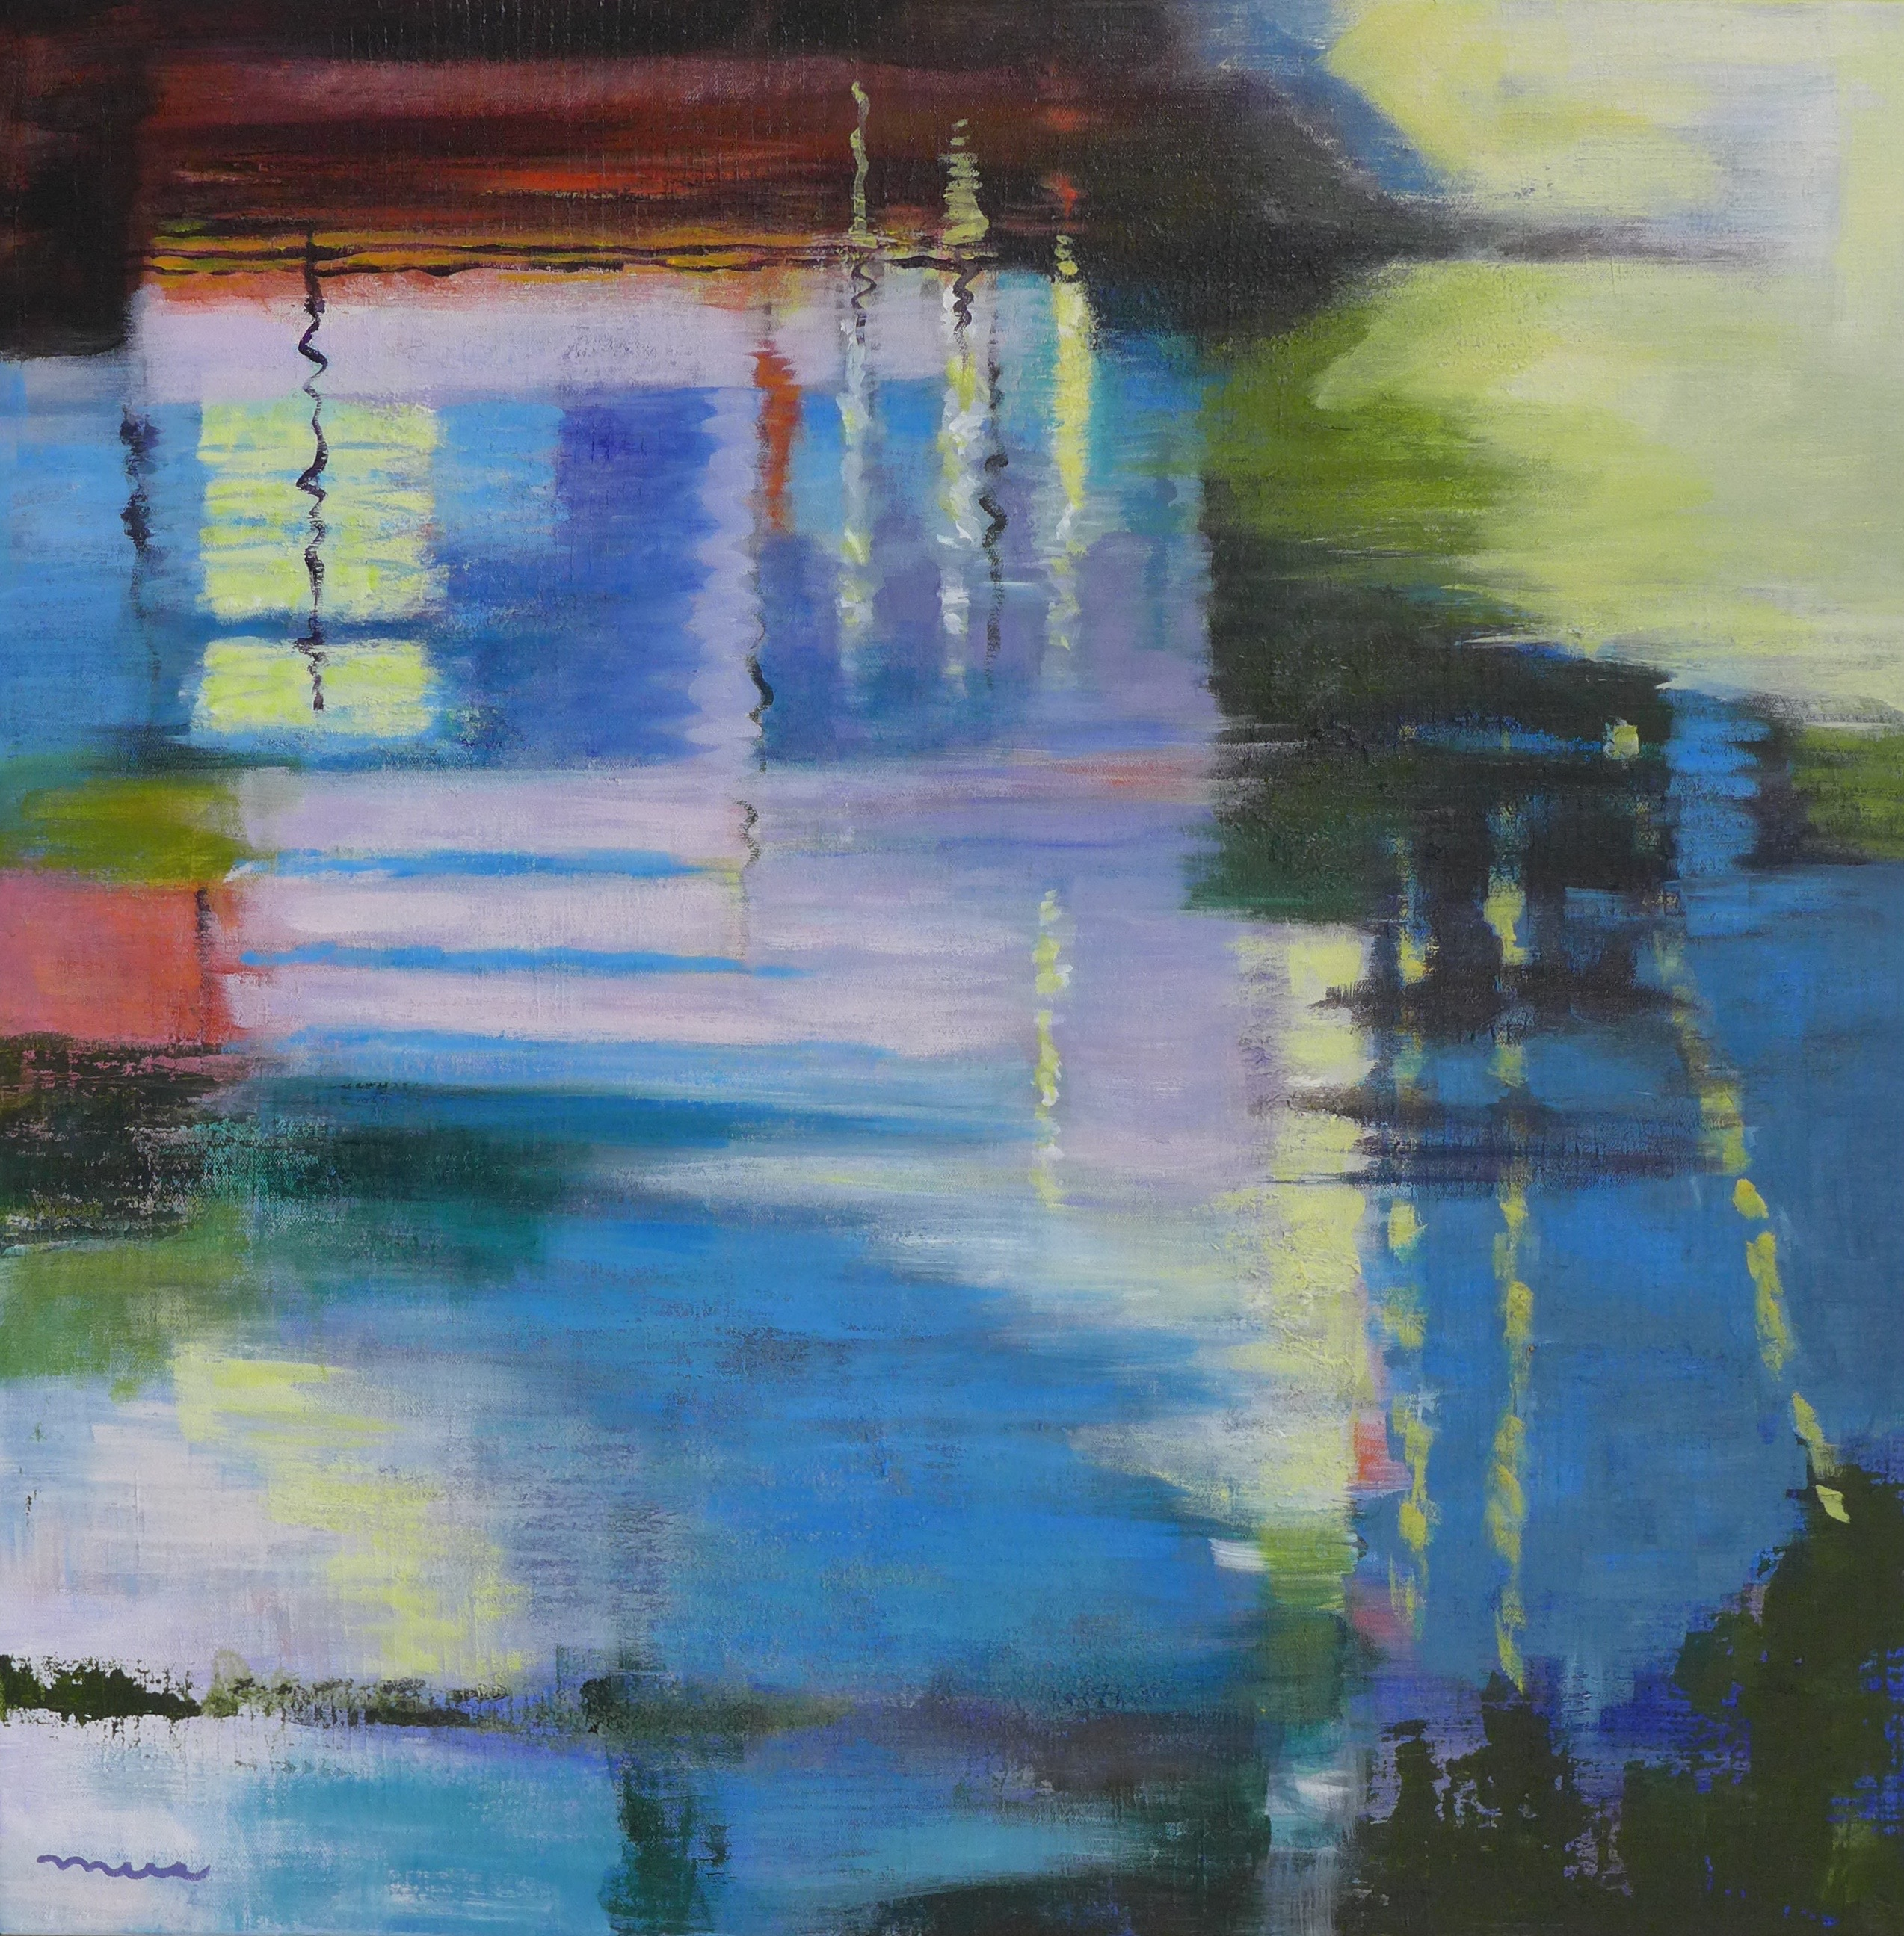 Marina Reflections #1 Mira Kamada